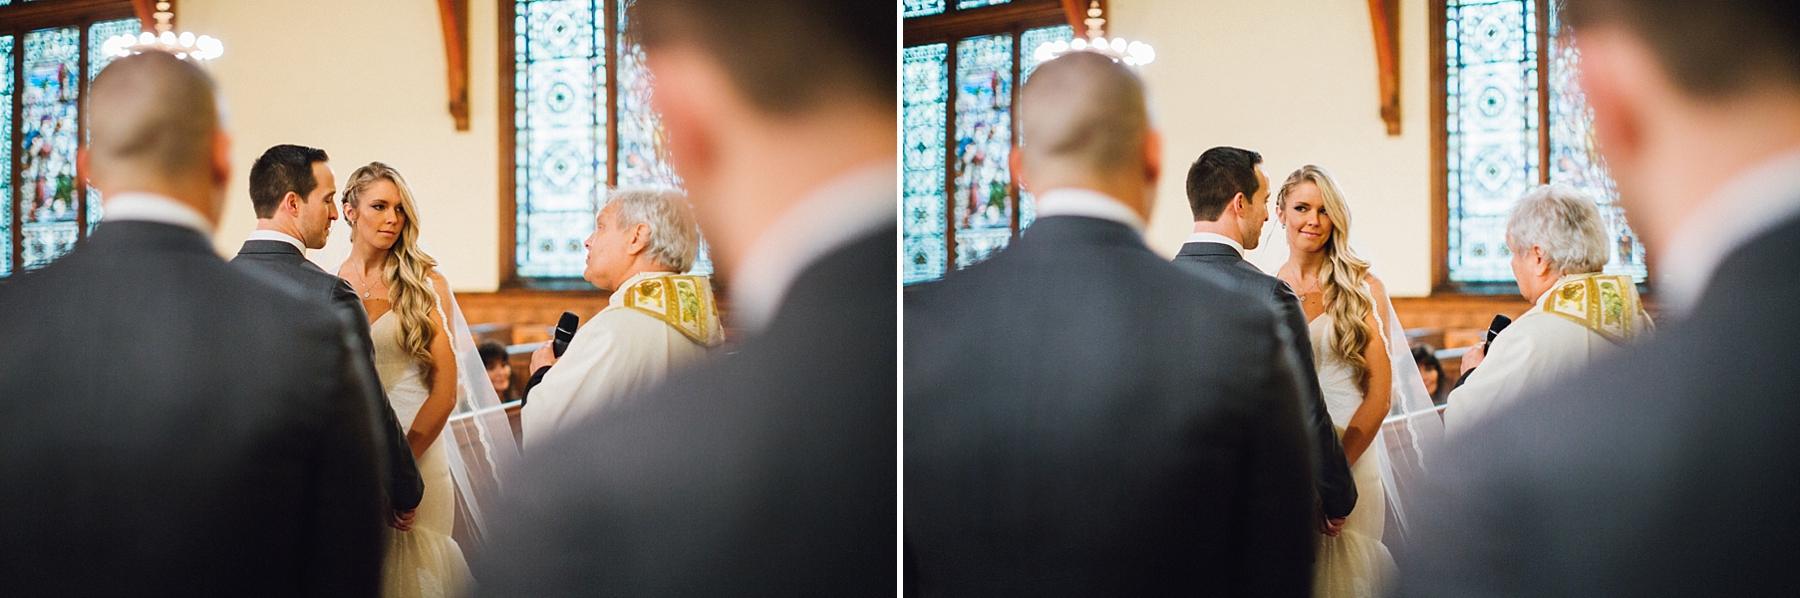 nj-monmouth-county-wedding-photographer-long-branch_0028.jpg